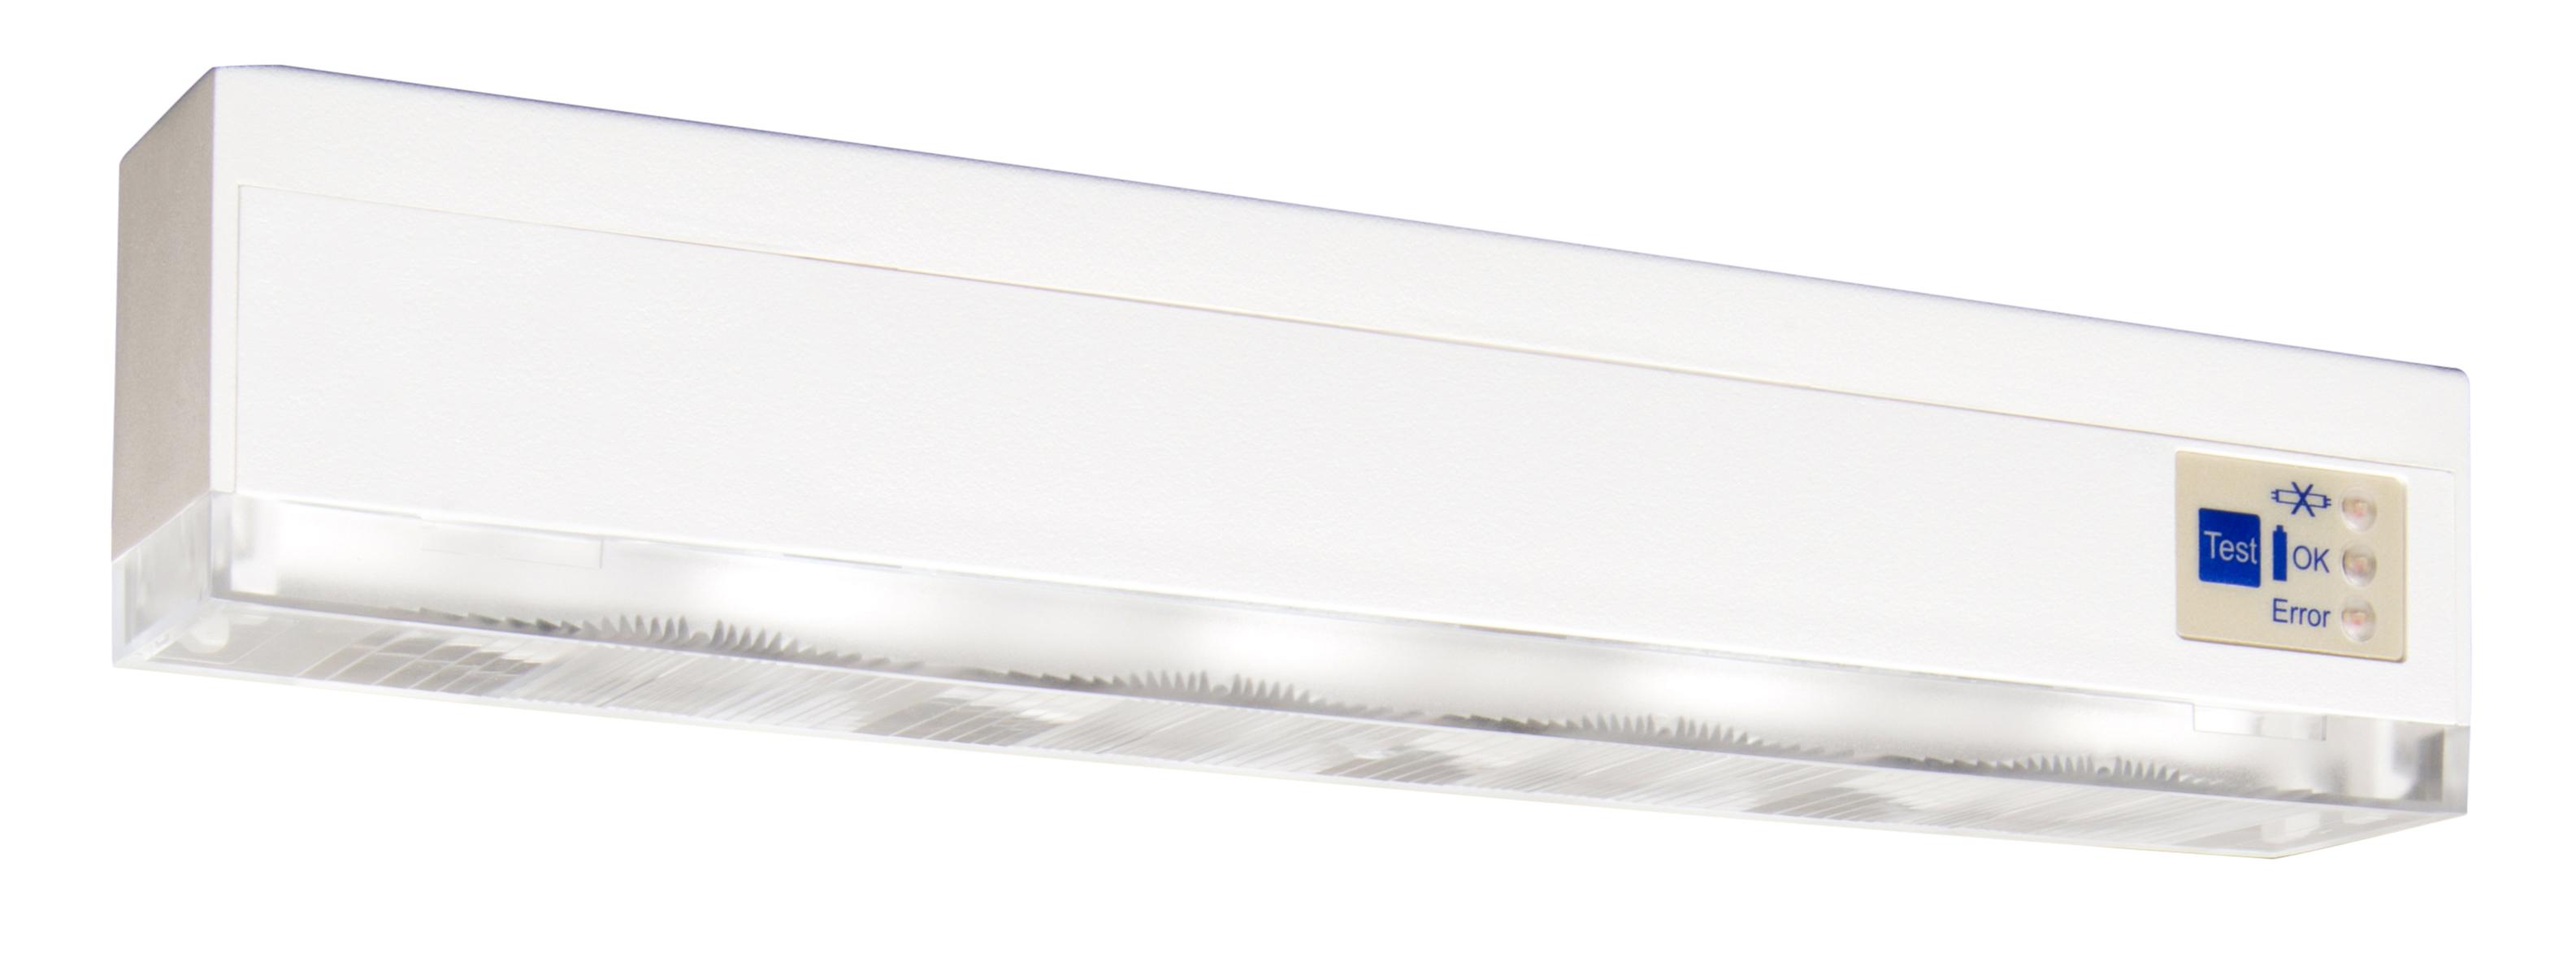 1 Stk Notleuchte KMB Autotest LED 1h/3h/8h 230VAC Universalmontage NLKMB003SC